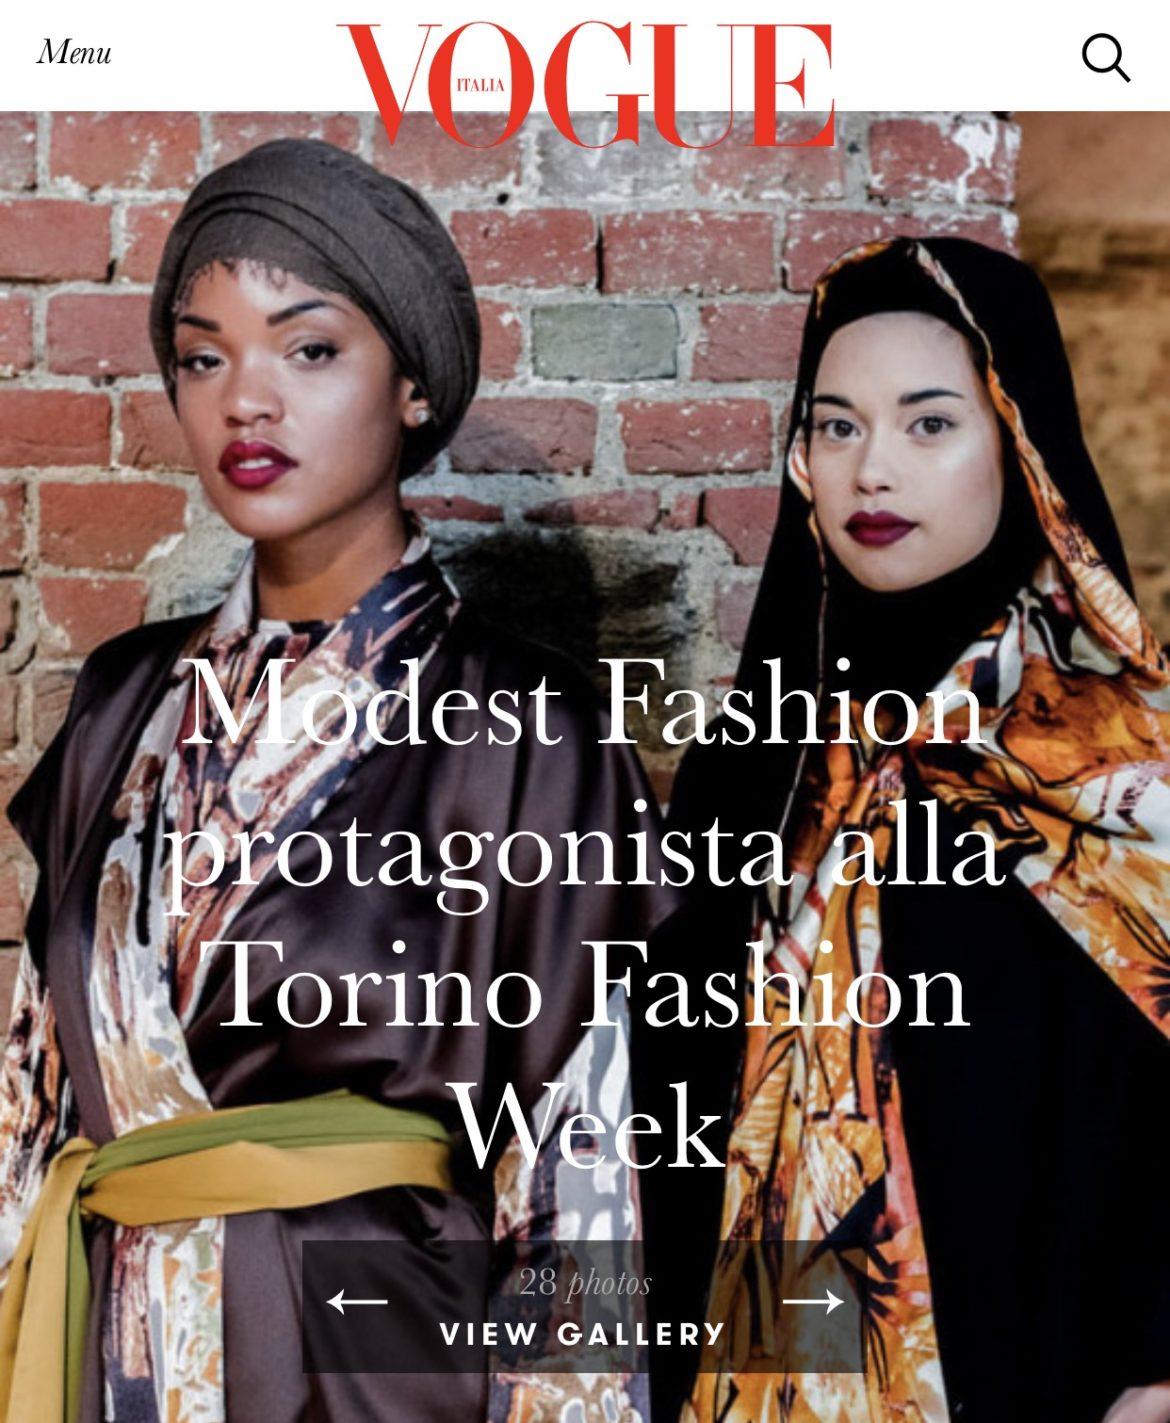 VOGUE Italia – Modest Fashion At Torino Fashion Week